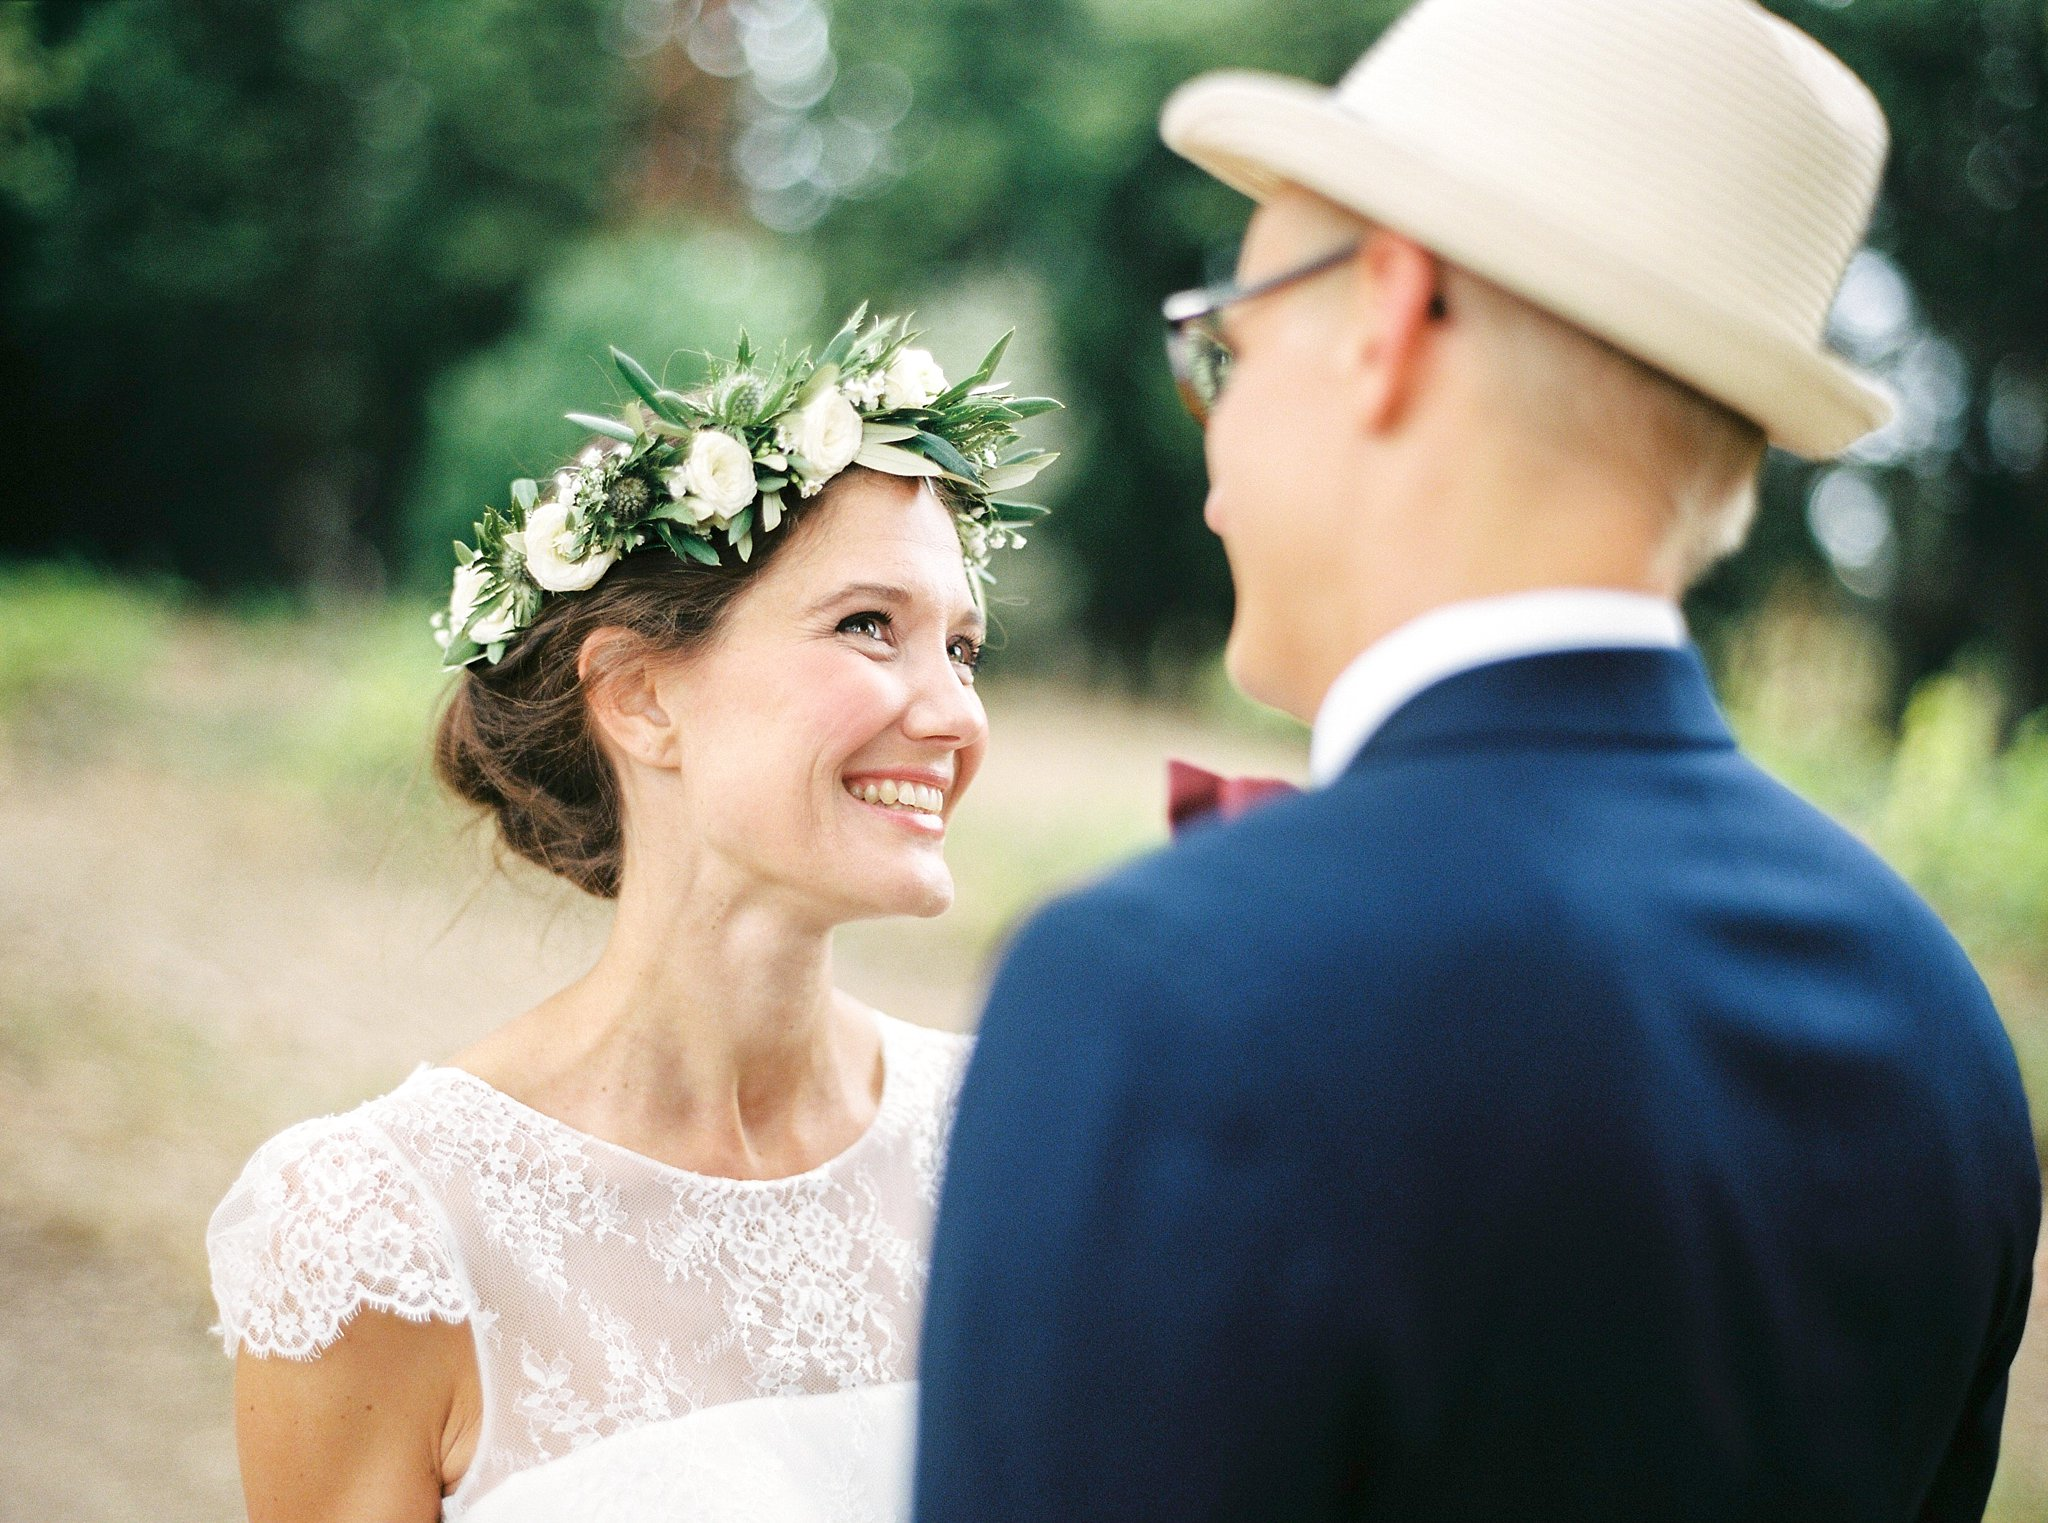 Wedding Photographer Perpignan - Château Las Collas Wedding - Hugo Hennequin025.jpg